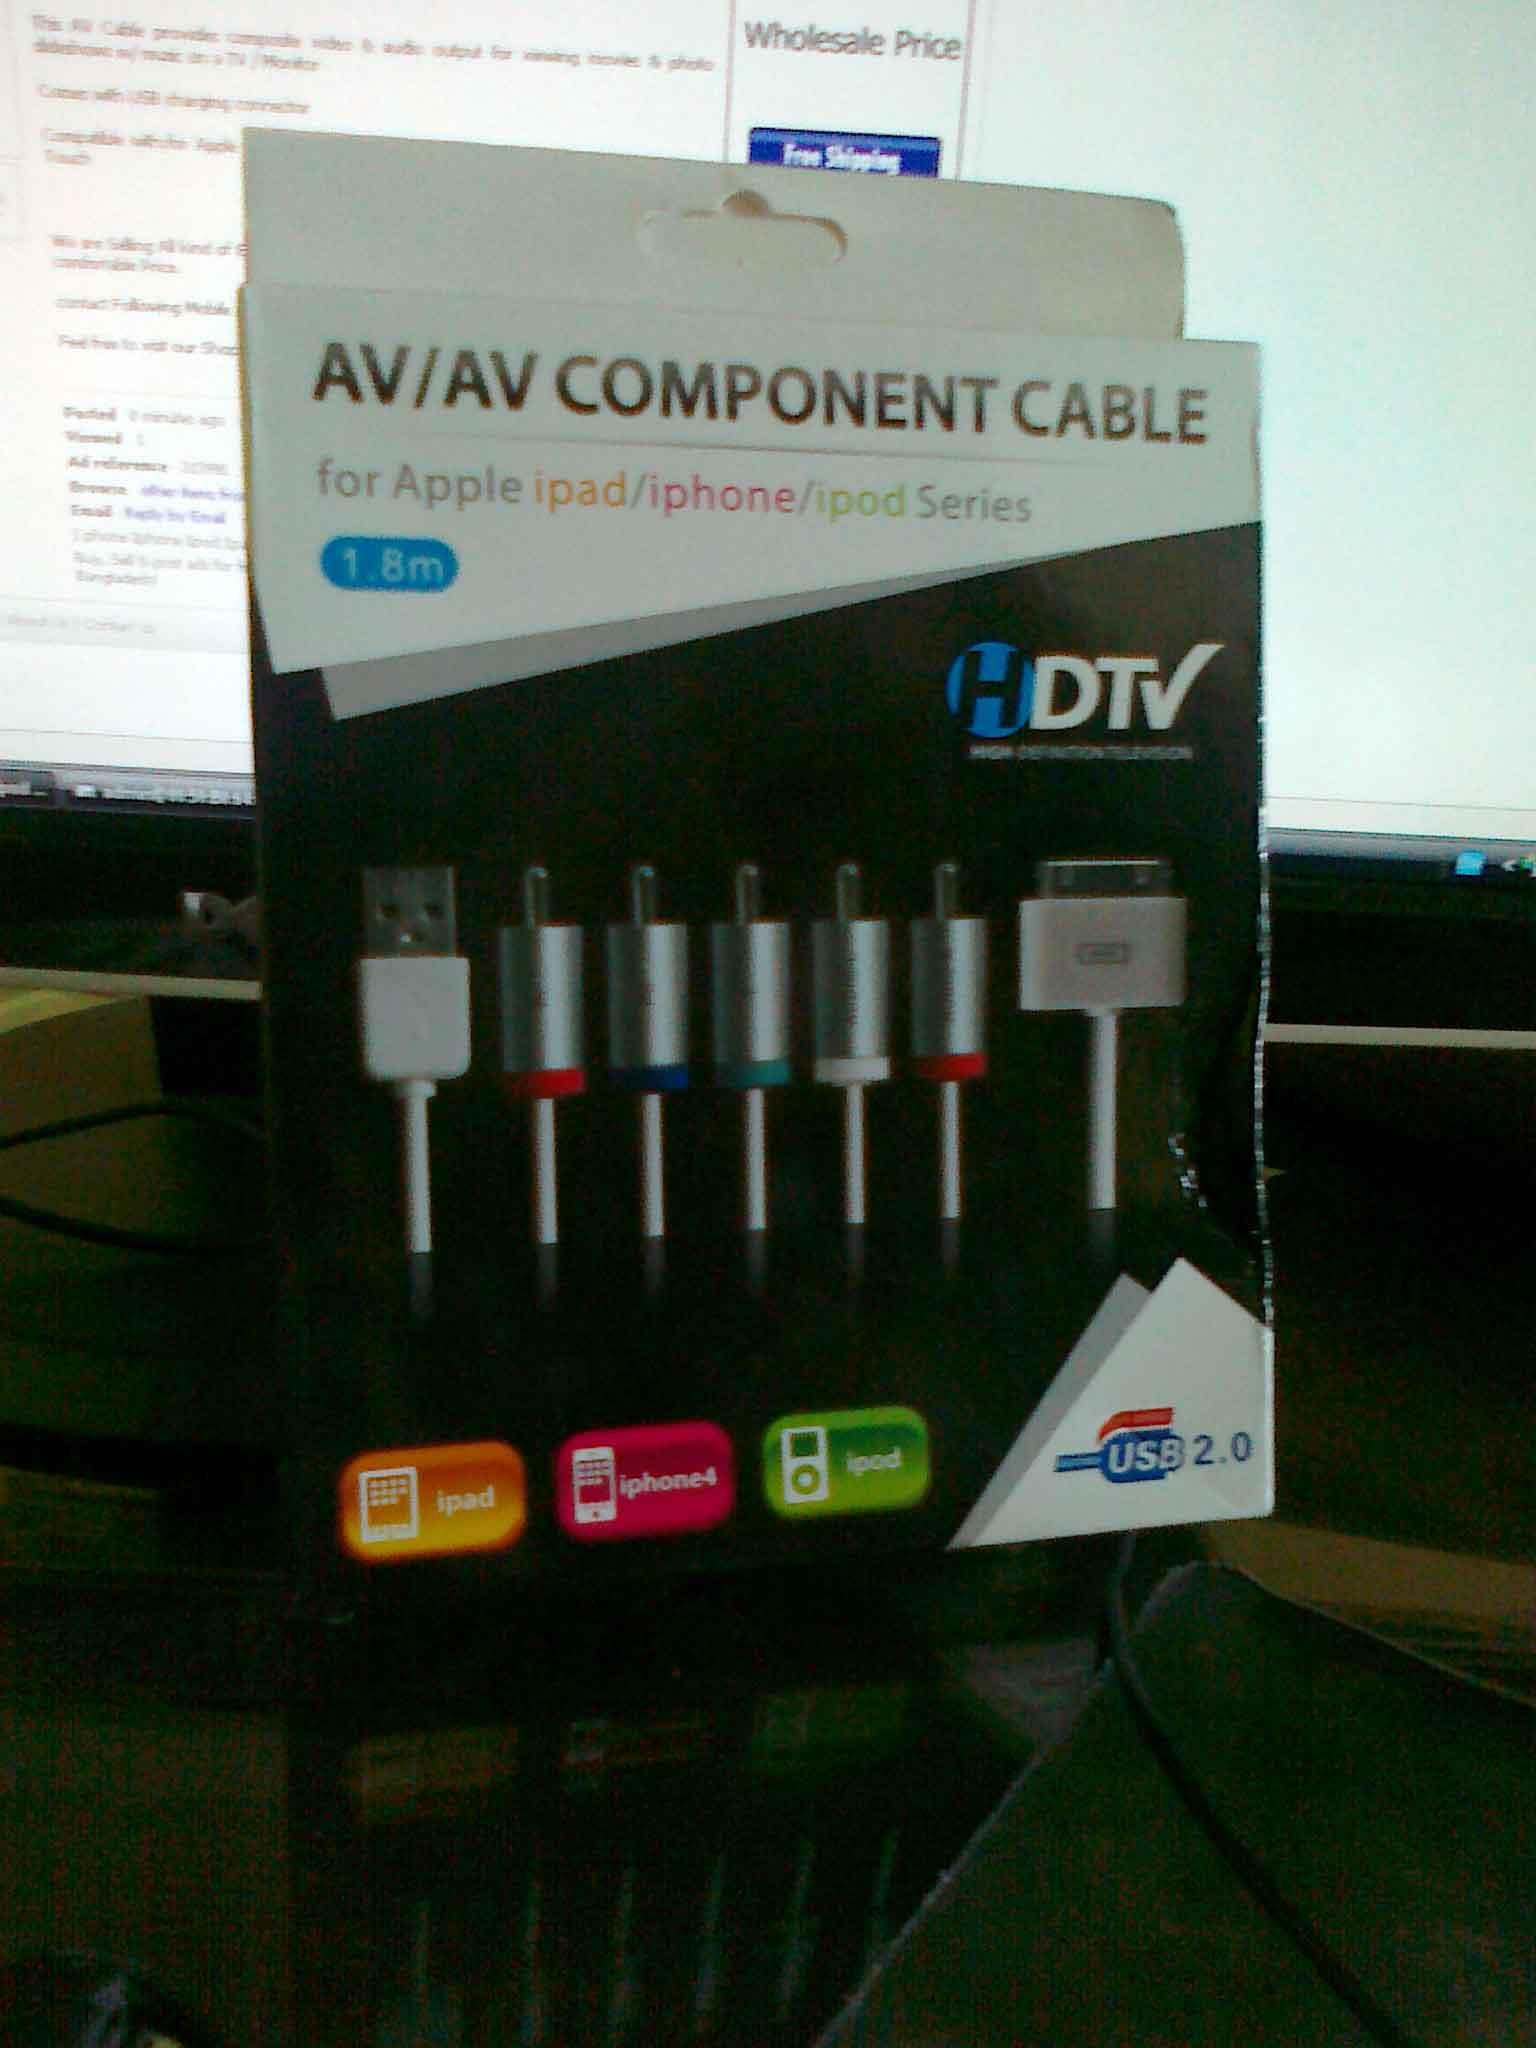 I phone Iphone Ipod Ipad AV TV USB Video Cable | ClickBD large image 0